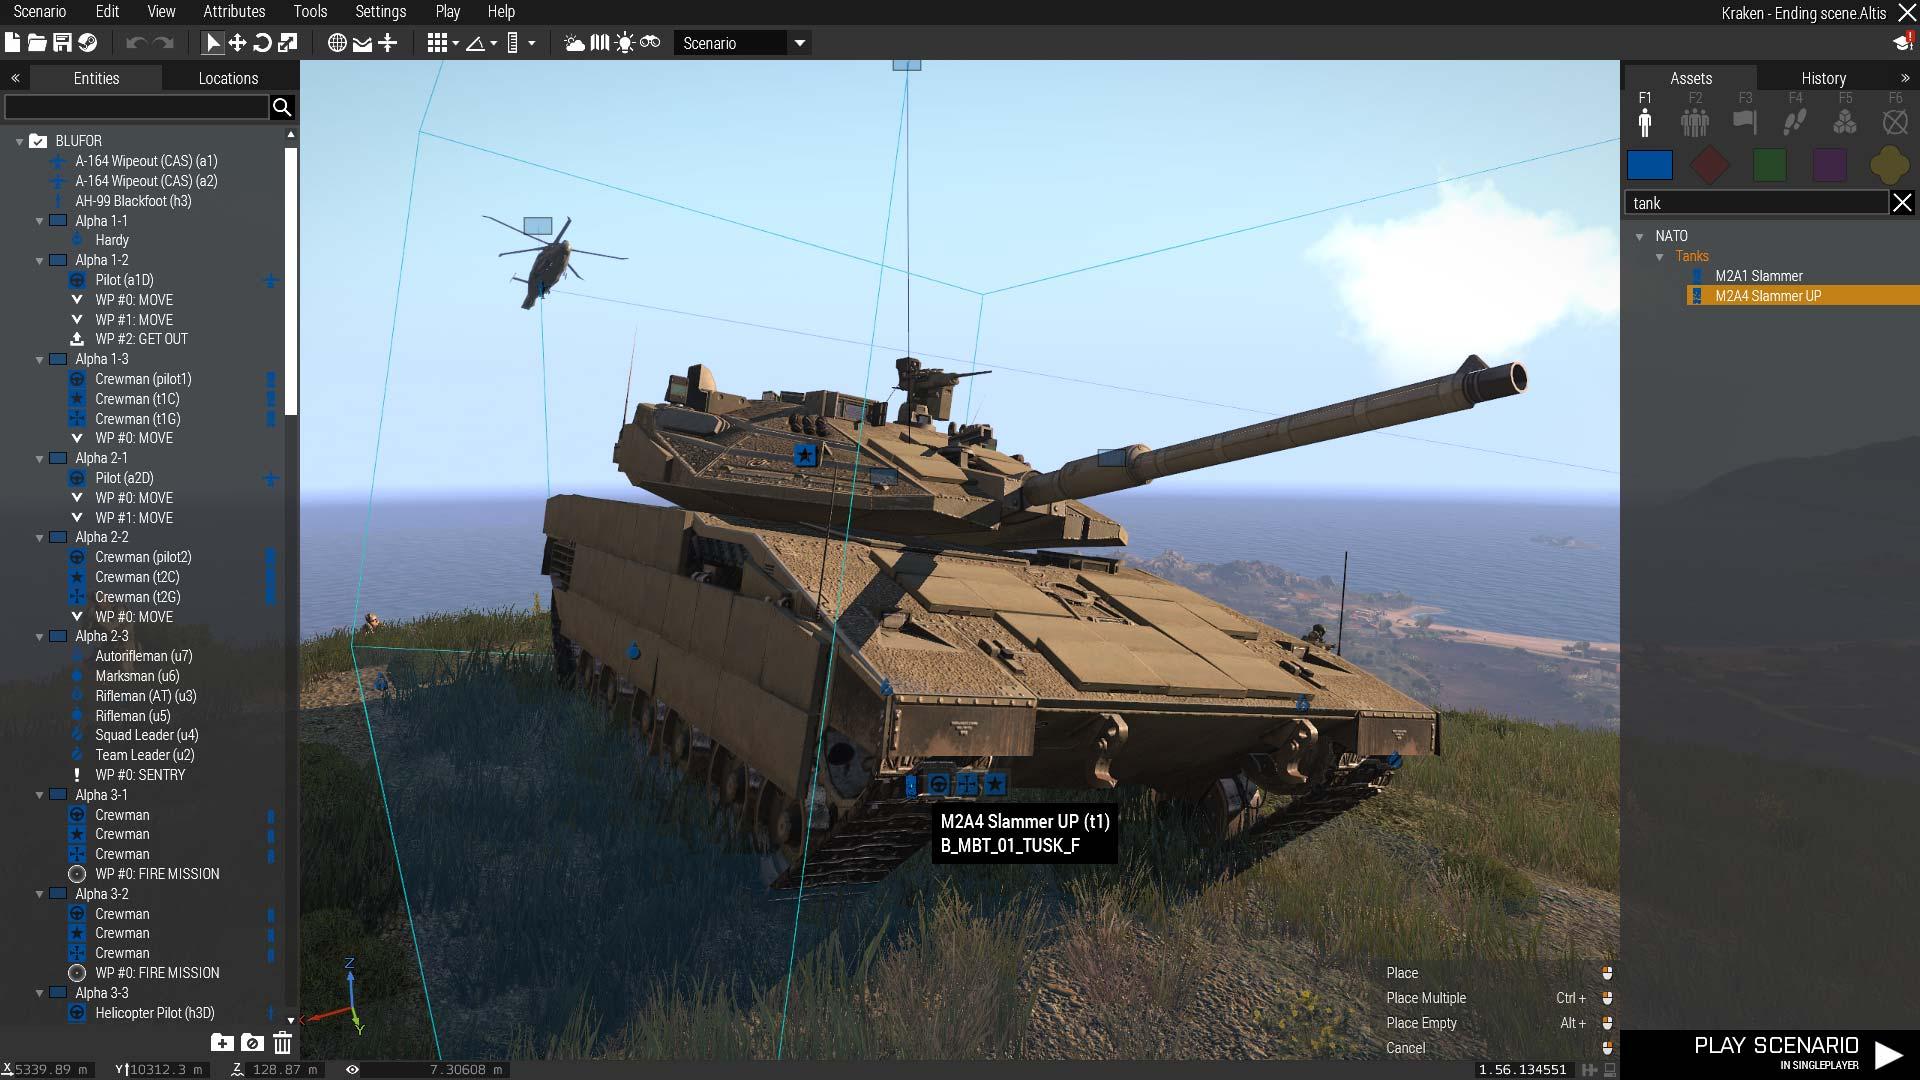 Arma 3 3d Editor image - RostRazzor - Mod DB